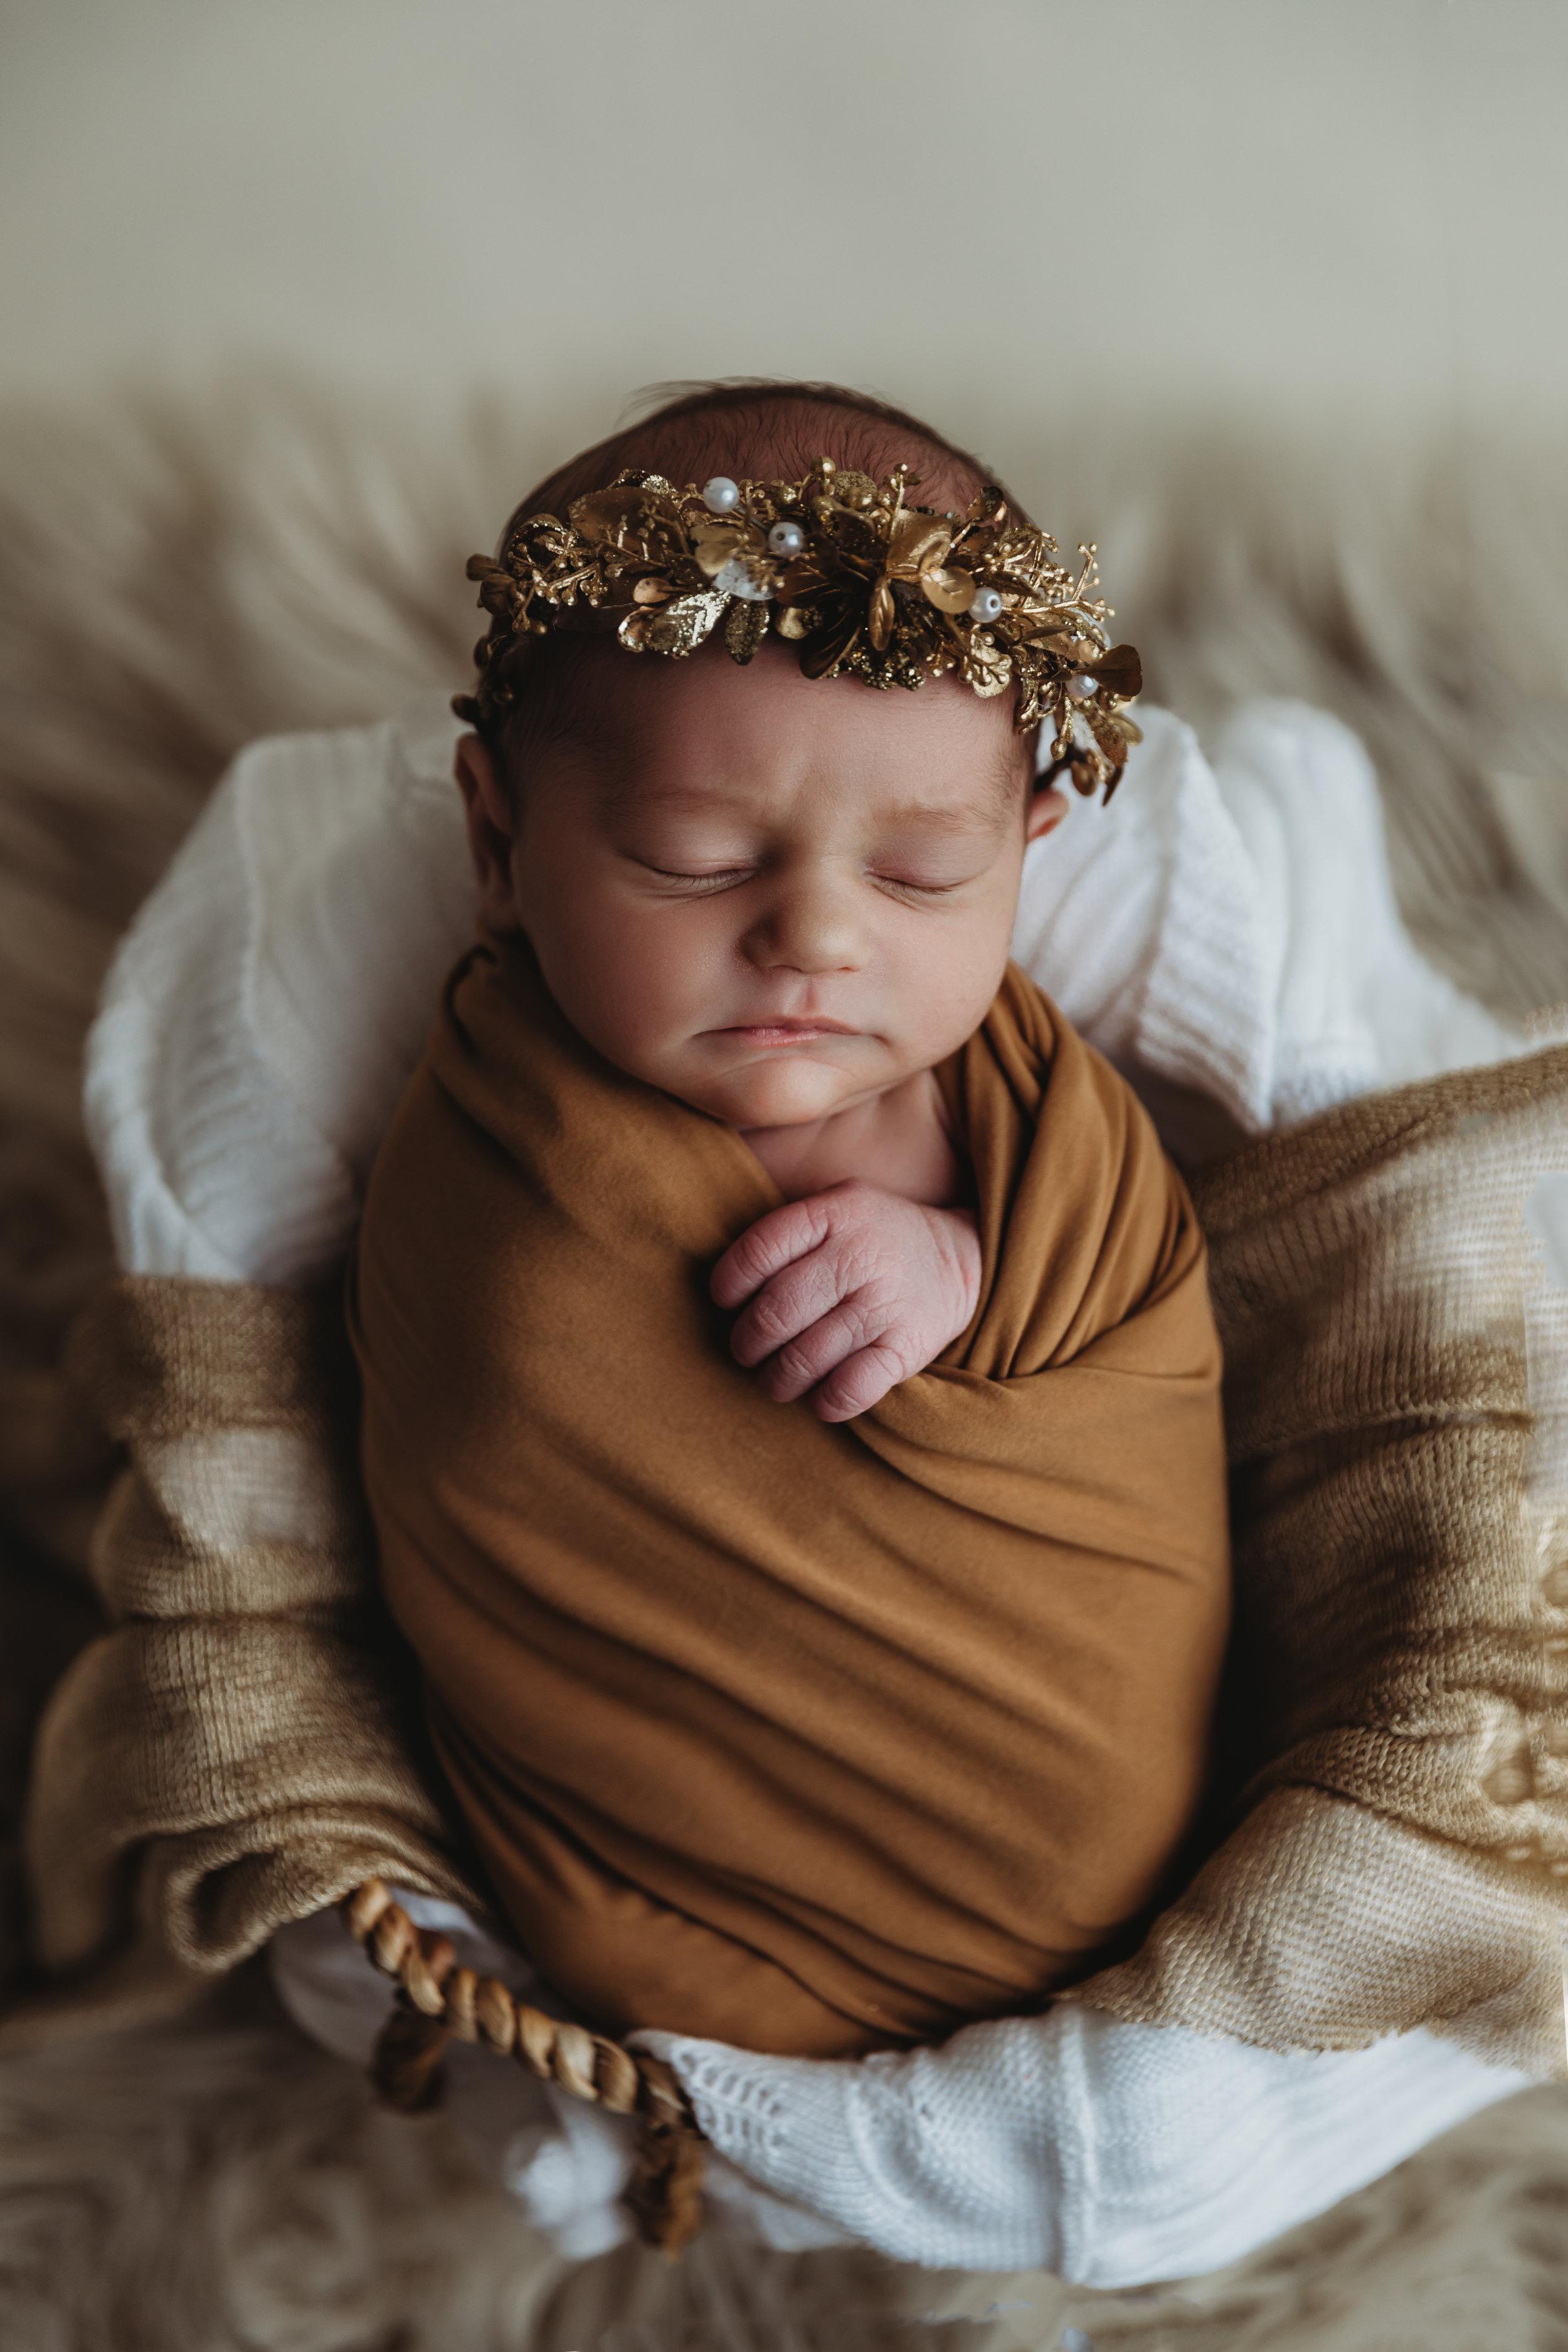 newborn-photography-austin-minnesota-studio-albert-lea-minnesota-gold-modern-bucket-pose